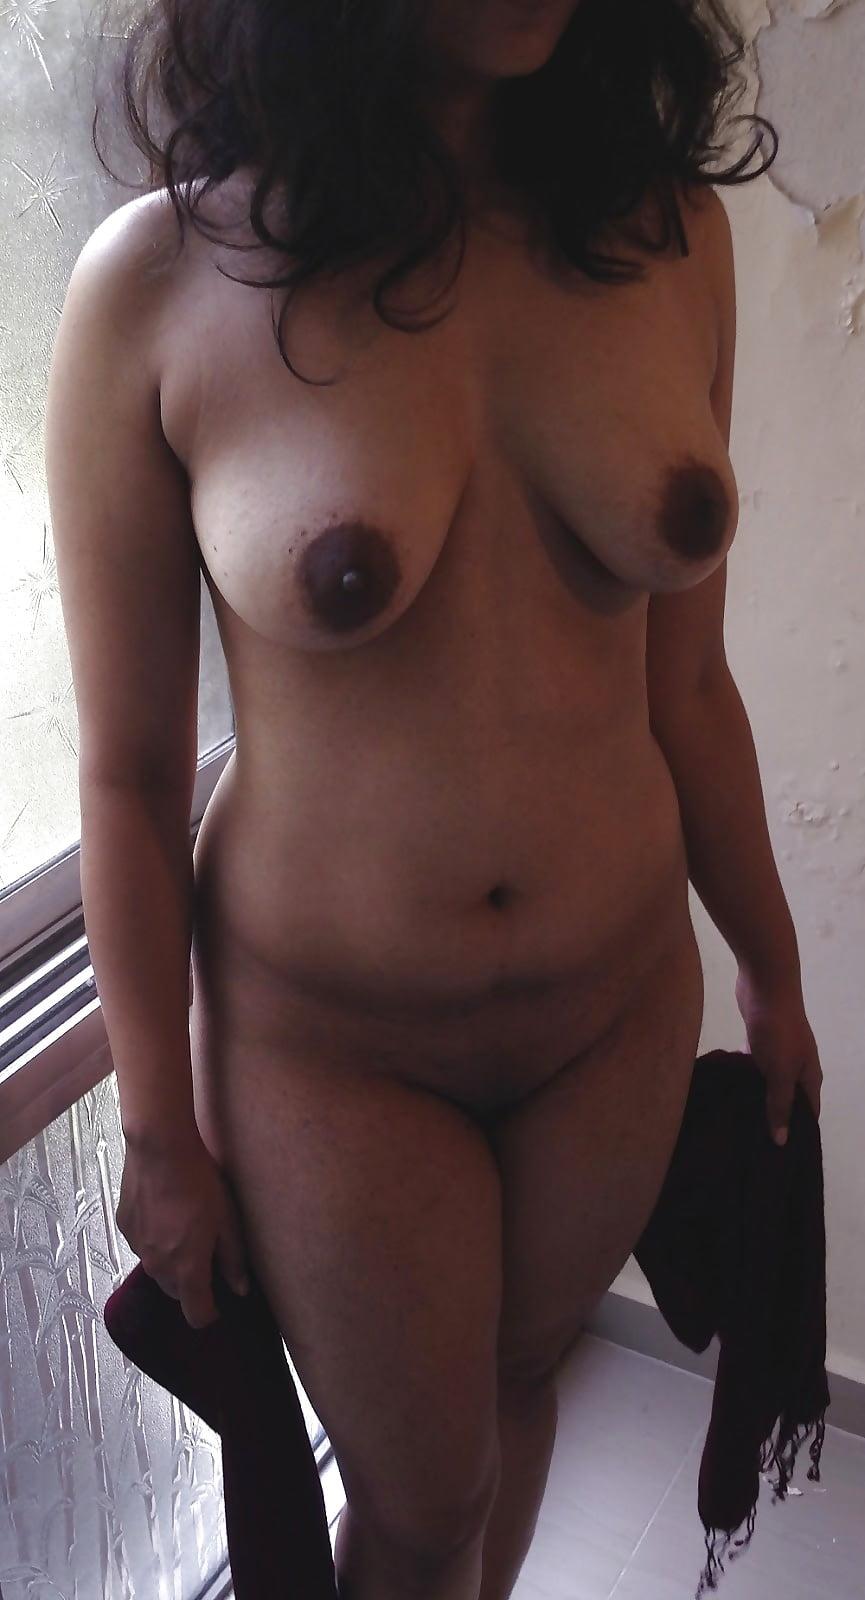 auntie-nude-gif